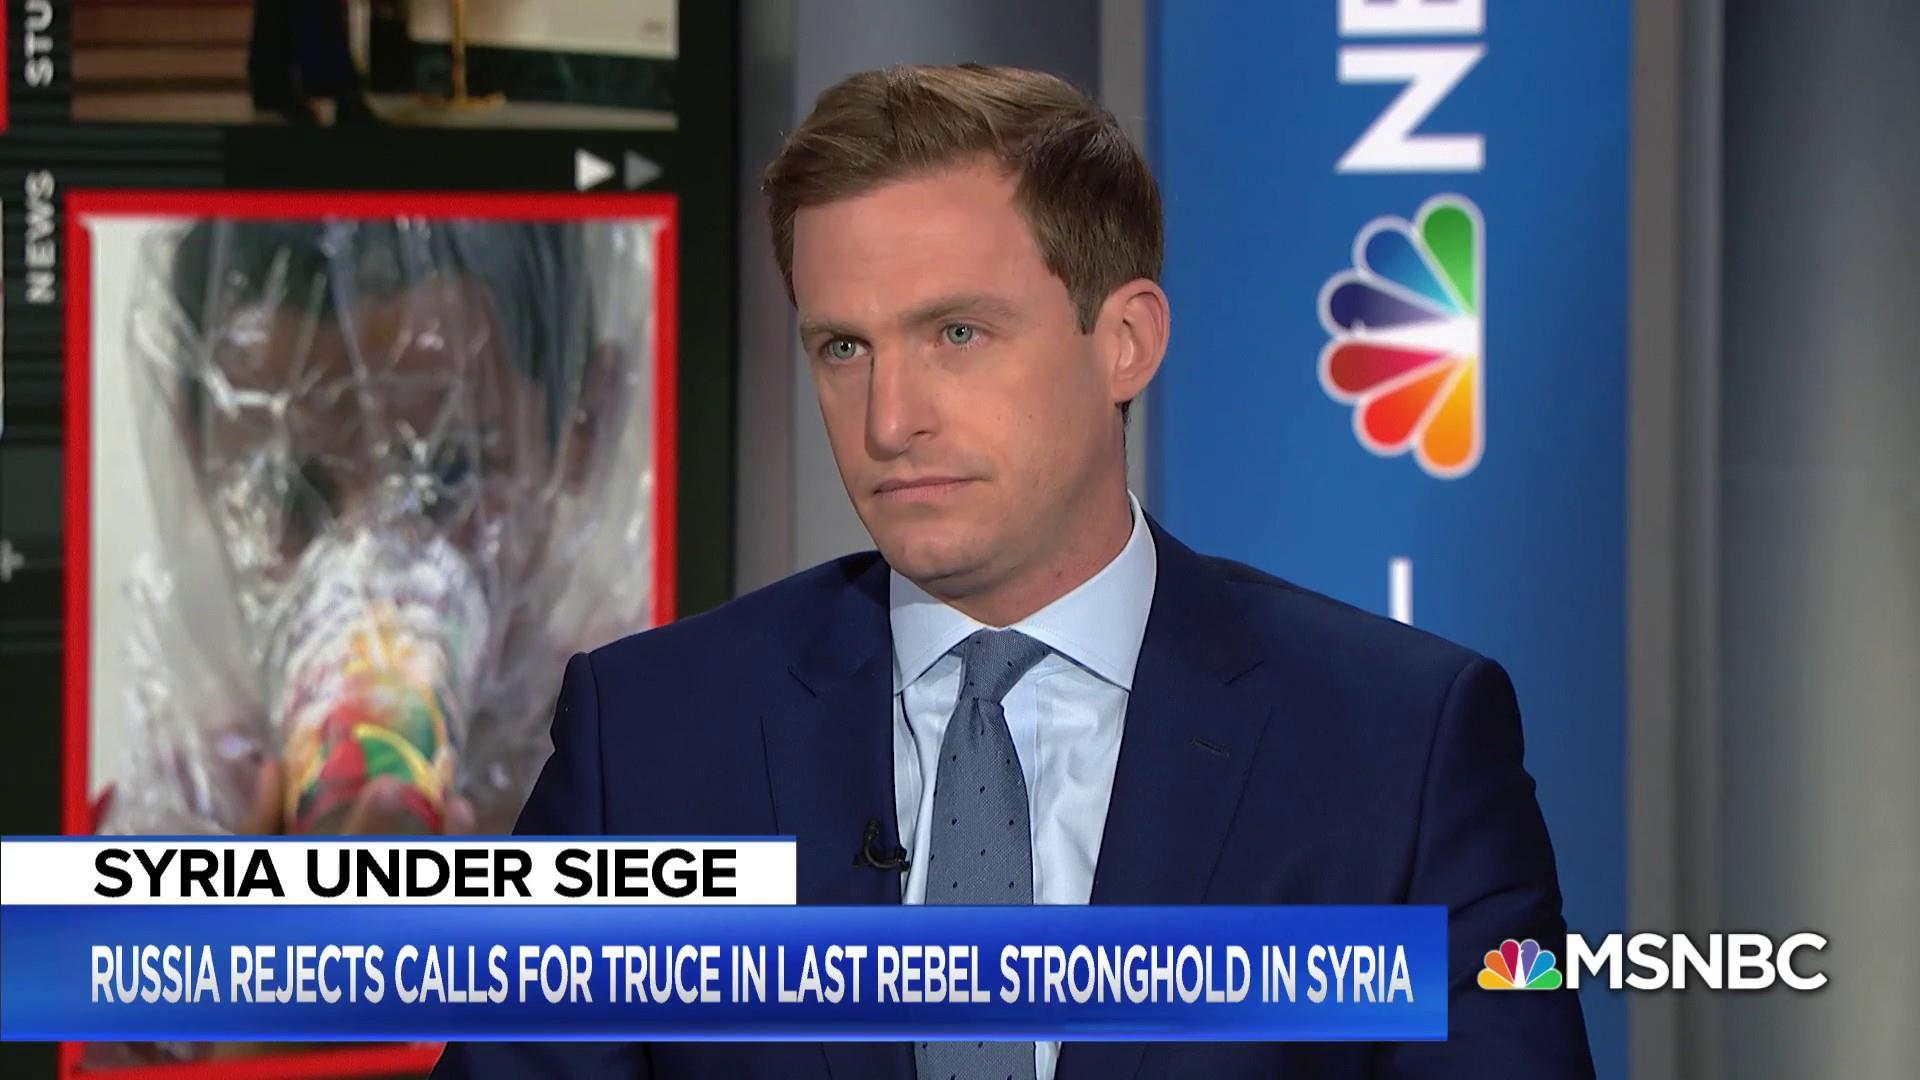 Syria's civil war: The U.S. has 'very few options left'